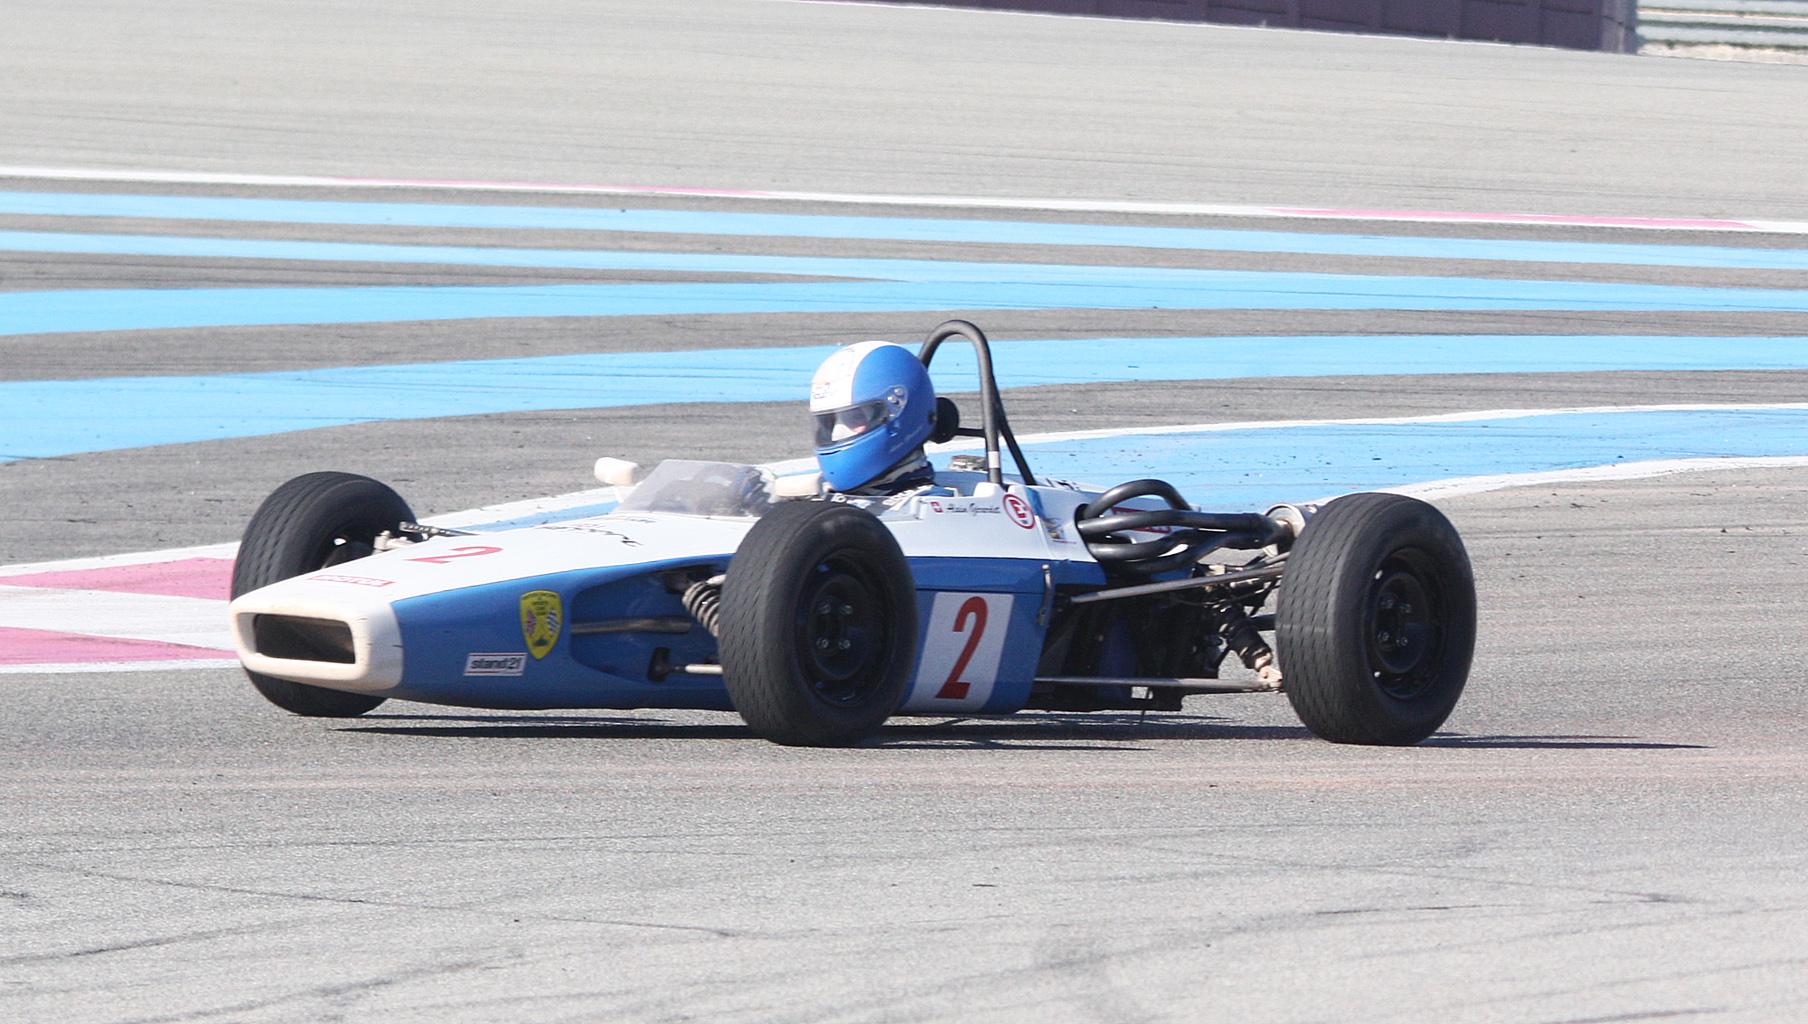 Alain Girardet - Lola T 200